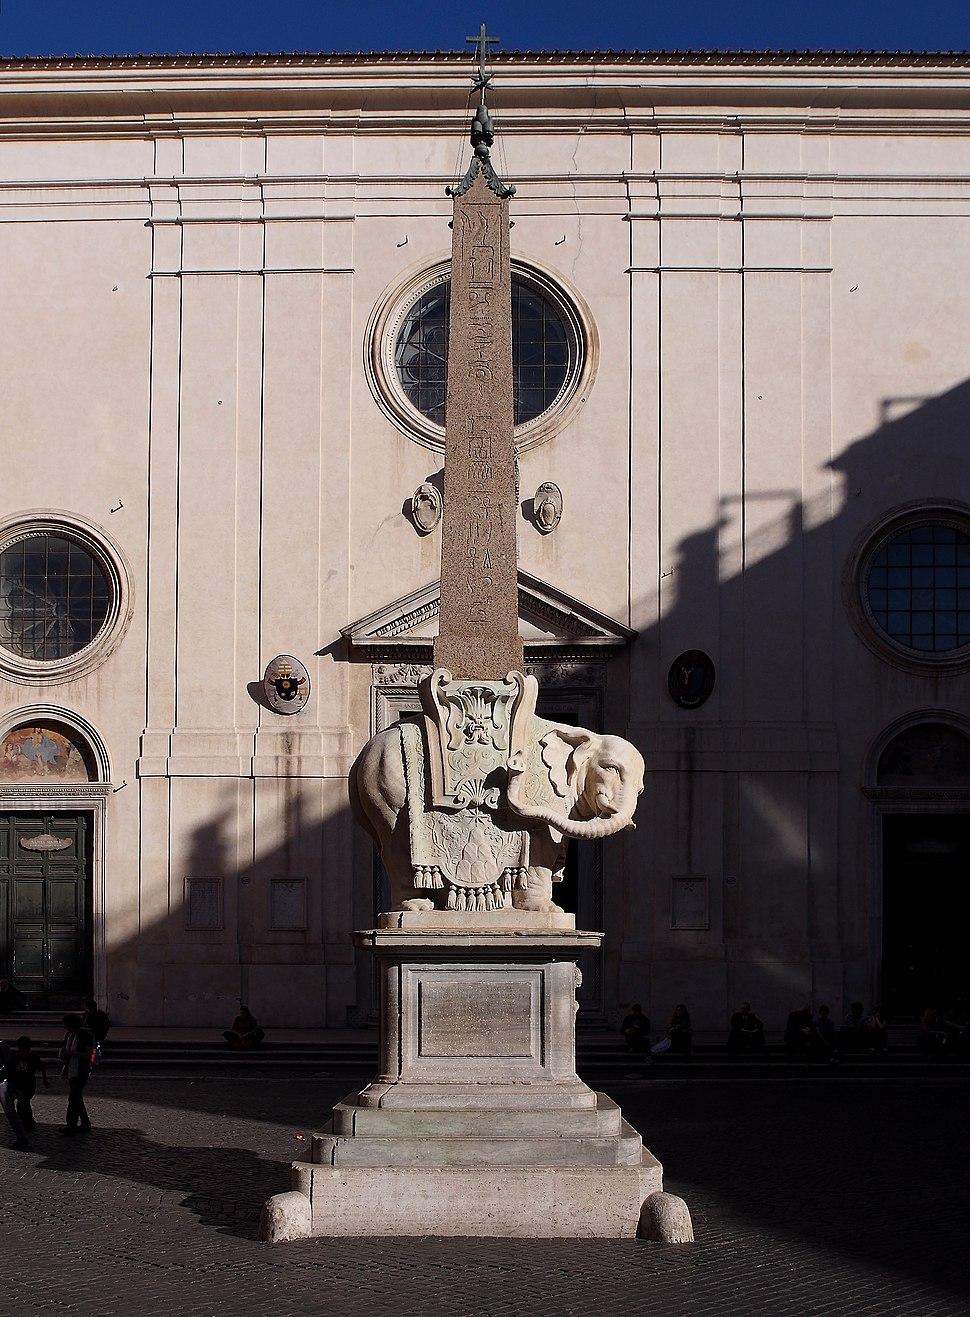 Elephant and Obelisk - Bernini